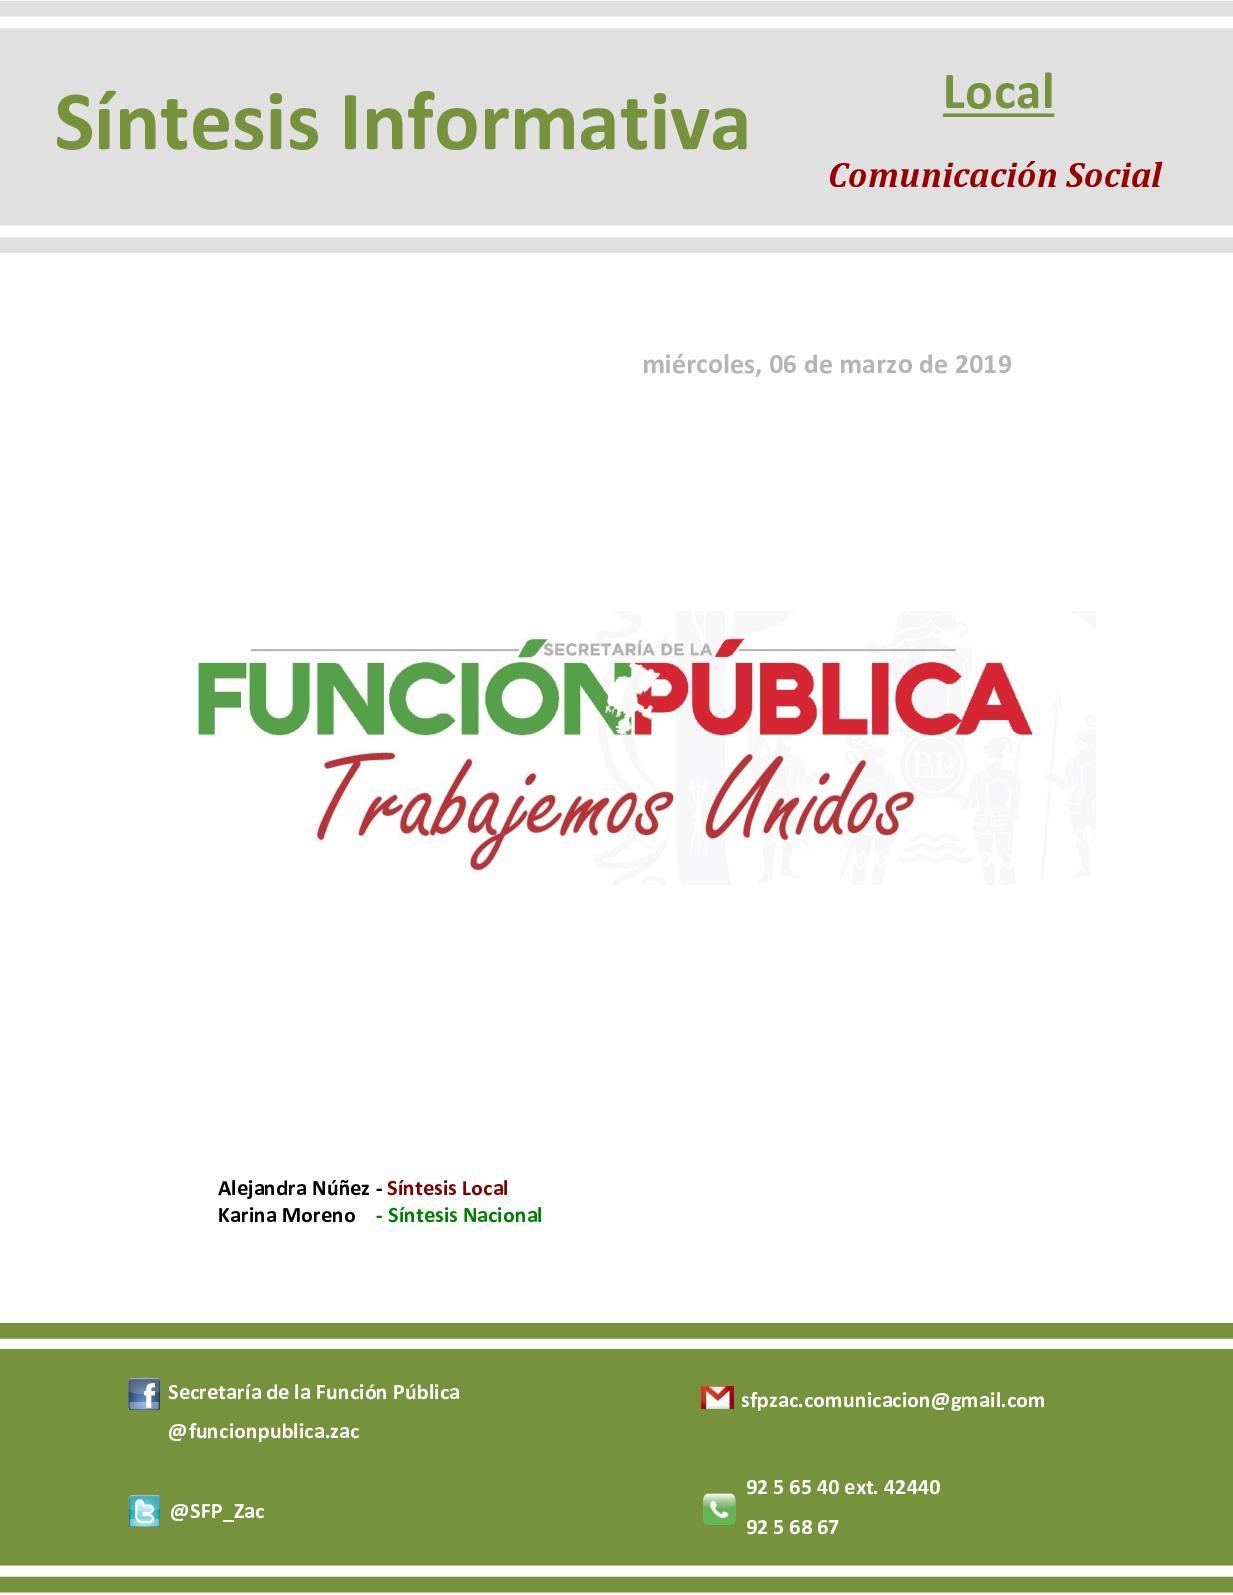 Síntesis Local-Nacional de Comunicación Social de la SFP 06-03-2019